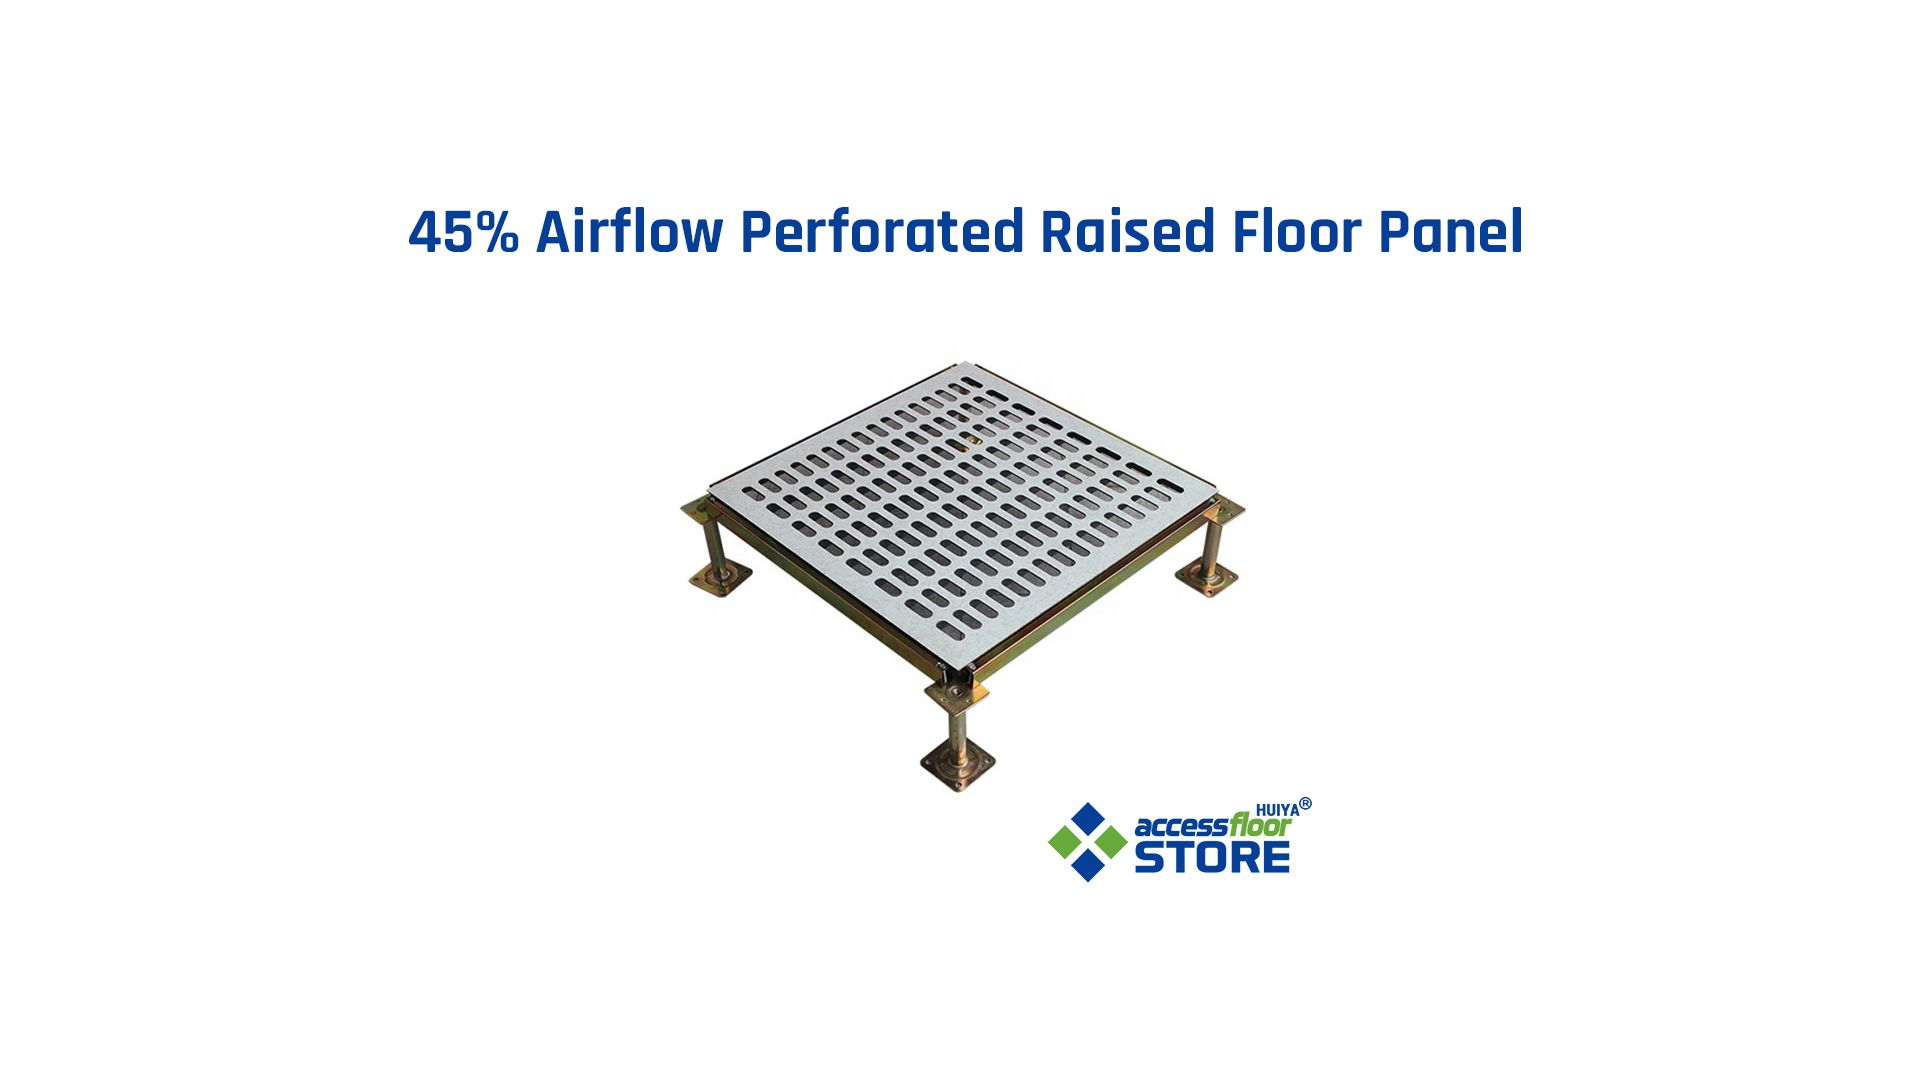 45 Airflow Perforated Raised Floor